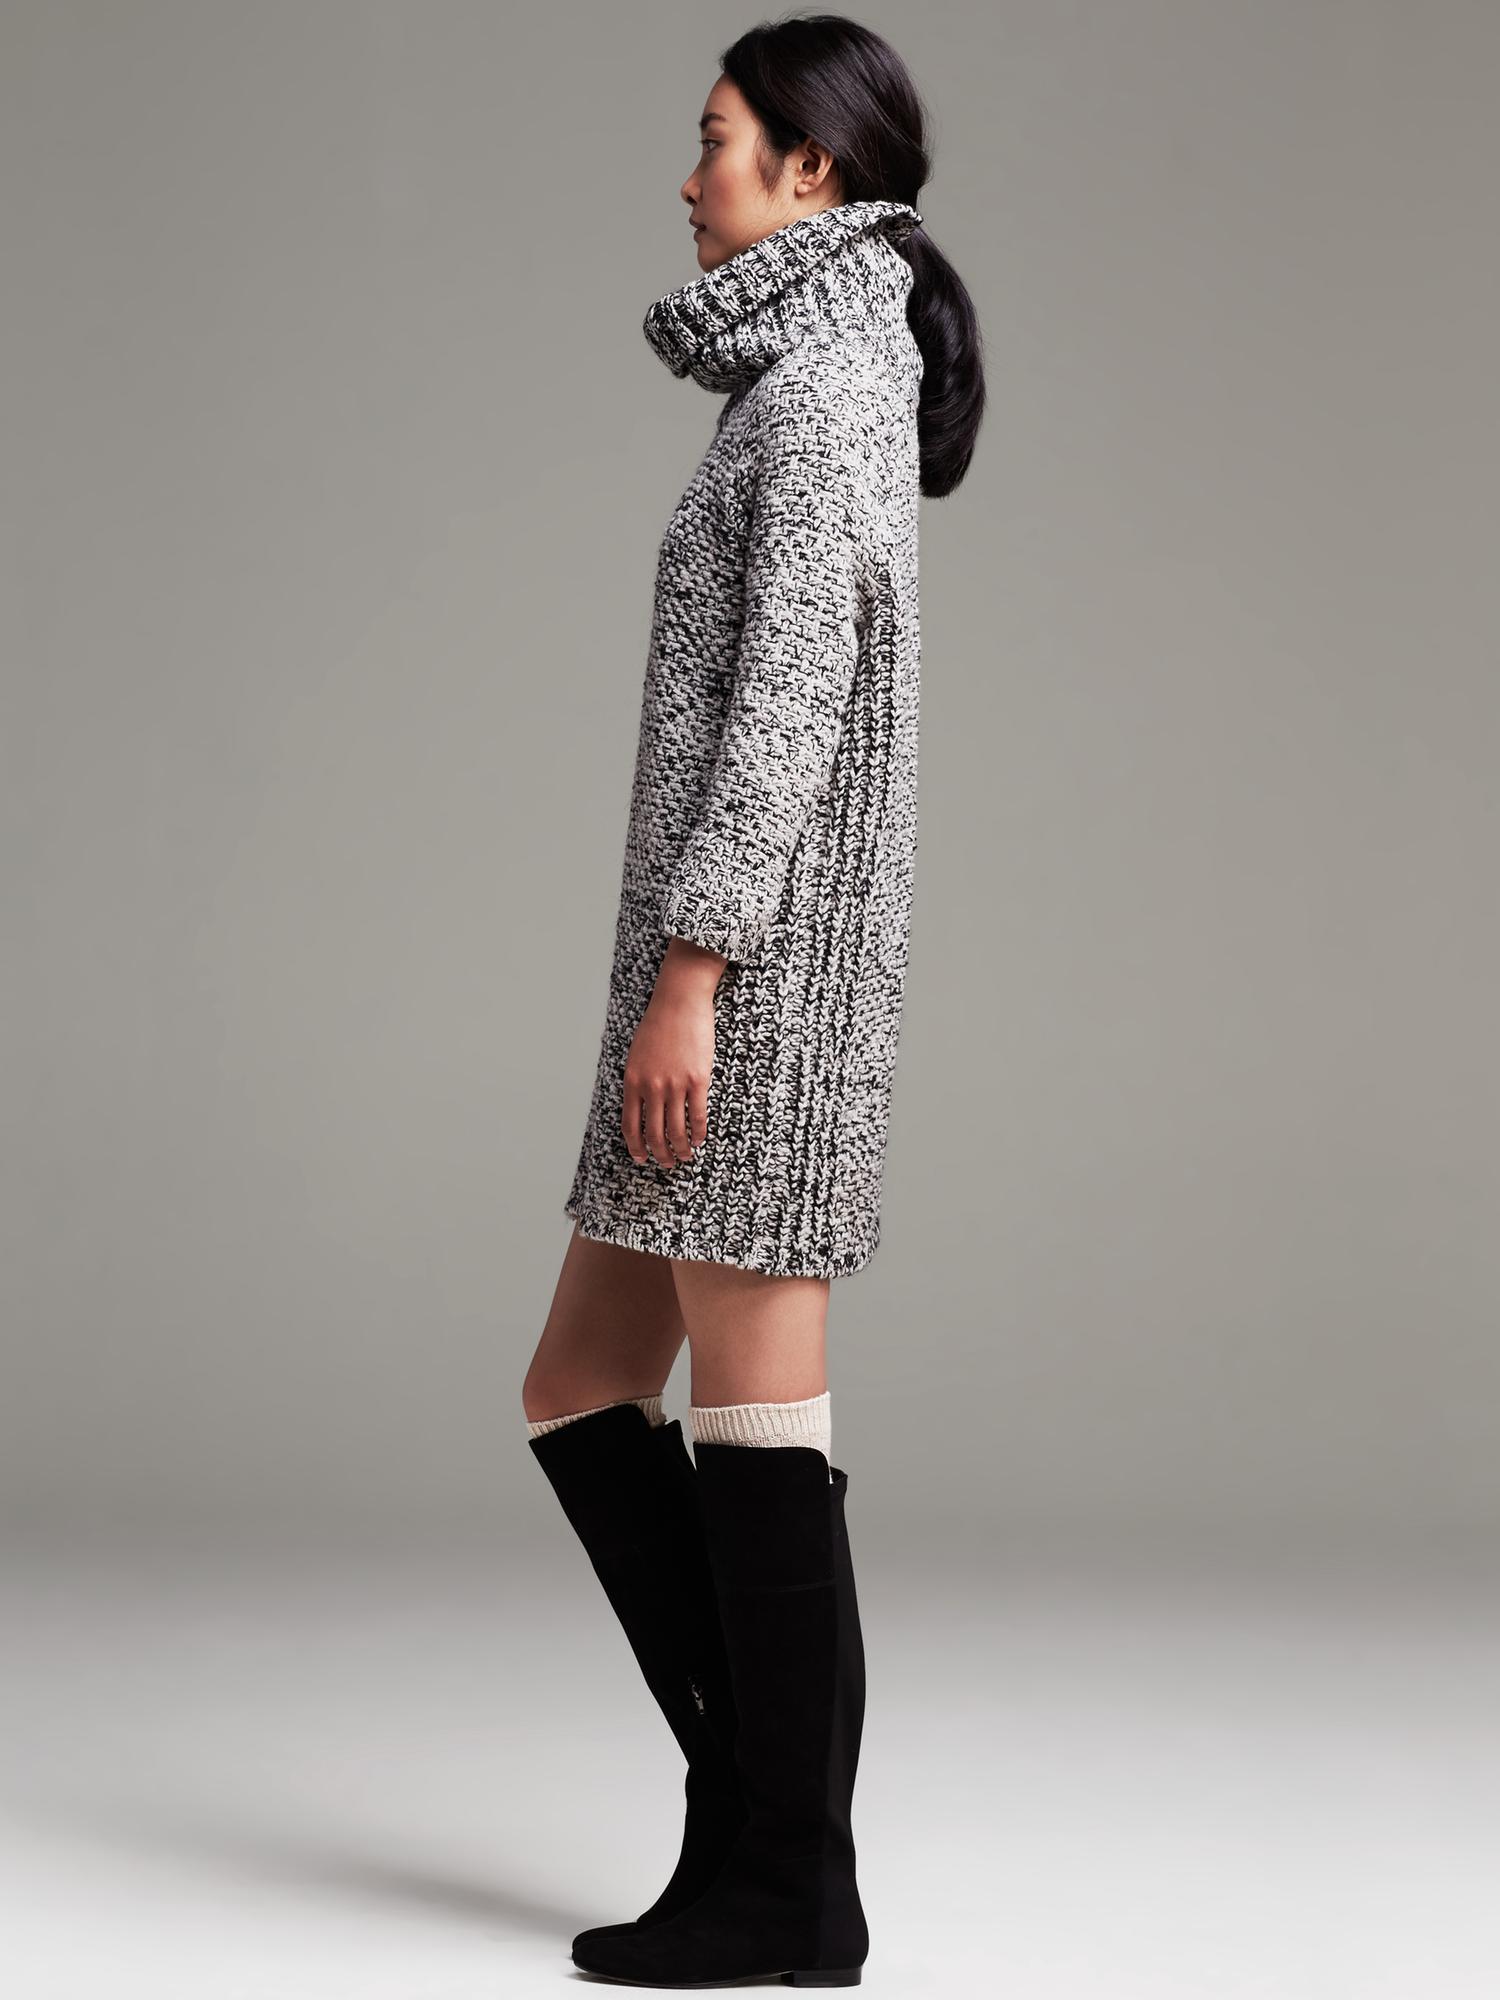 718a3df23c4 Banana Republic Heritage Marled Sweater Dress - Lyst